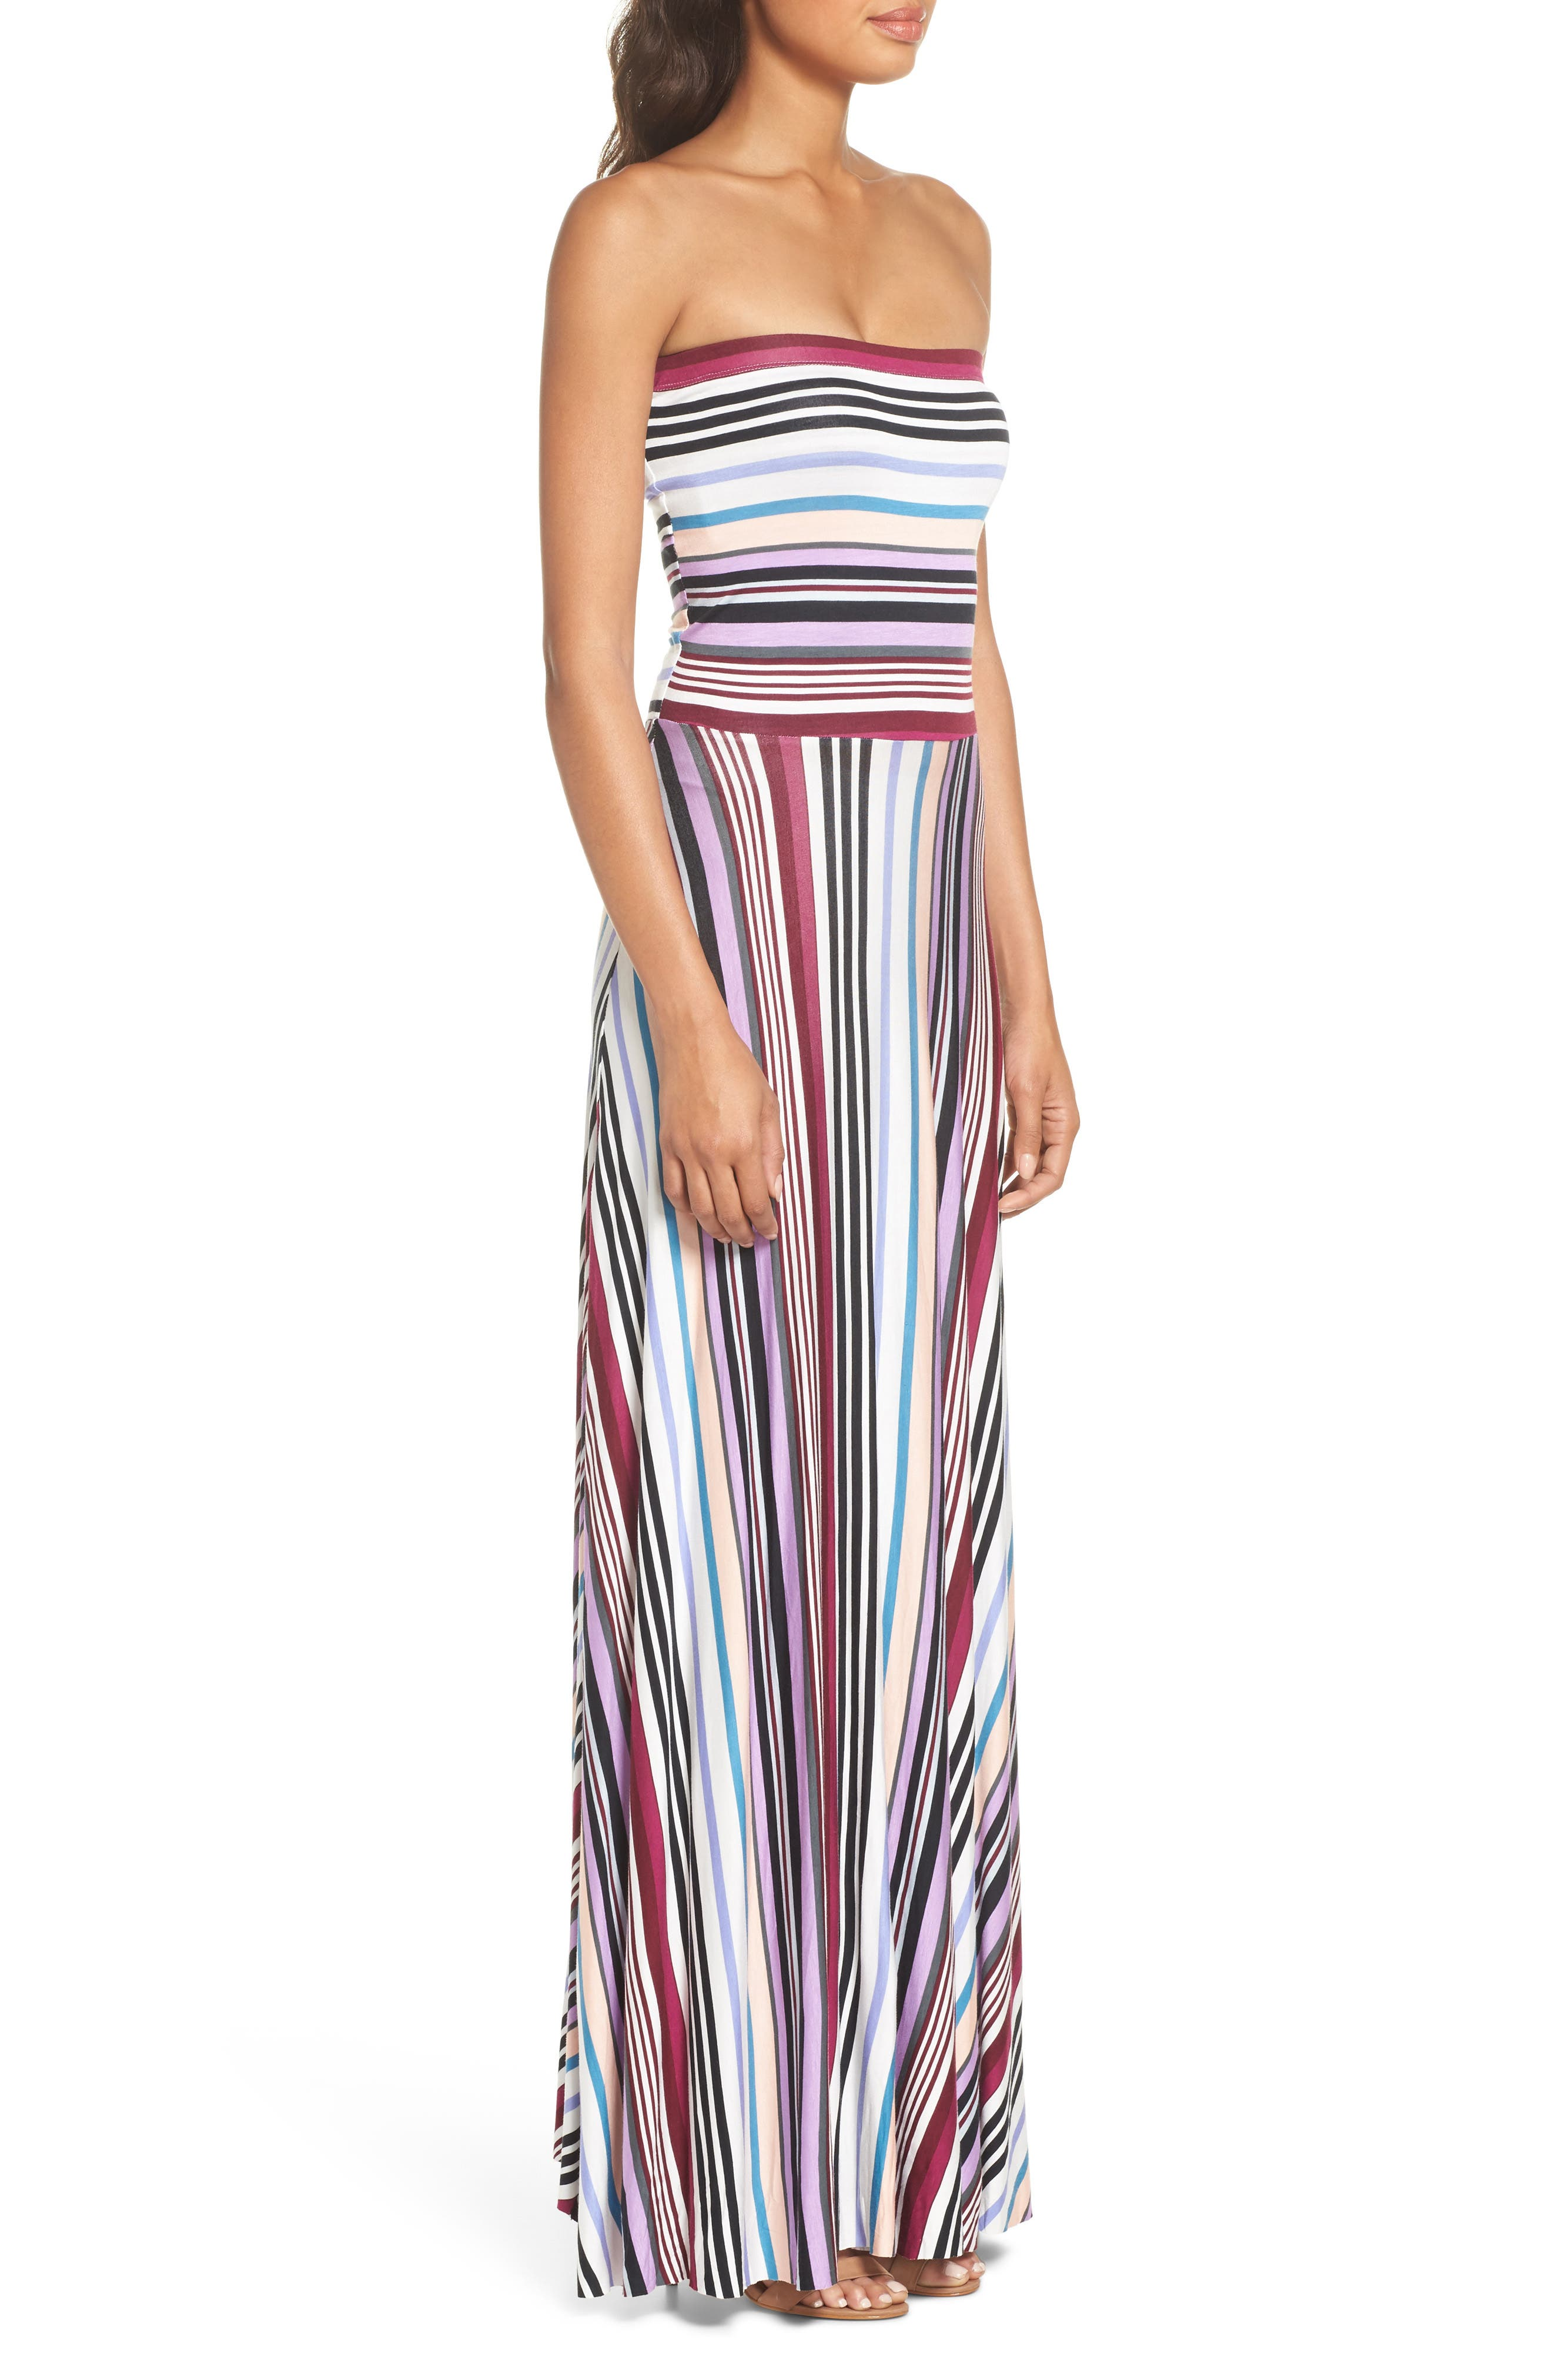 Clemette Strapless Maxi Dress,                             Alternate thumbnail 3, color,                             500